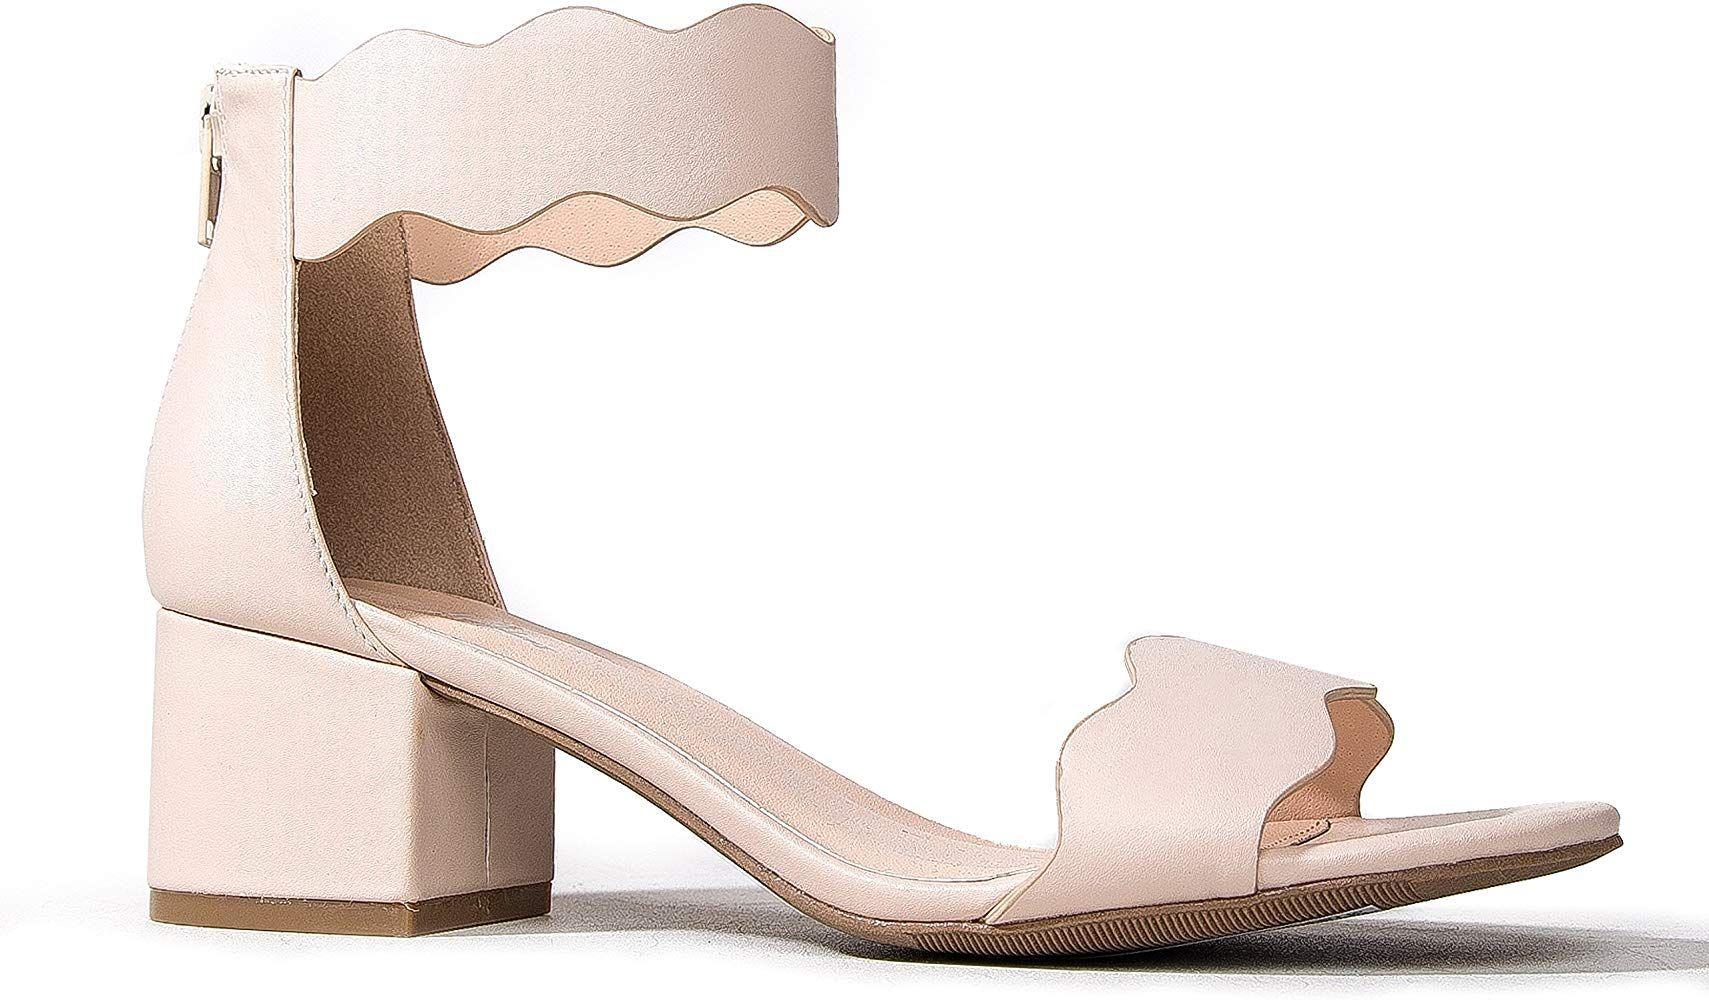 Amazon Com Suede Open Toe Ankle Strap Sandal Trendy Kitten Heel Shoe Low Block Formal Heel Mimi By J Adams Ankle Strap Sandals Kitten Heel Shoes Heels